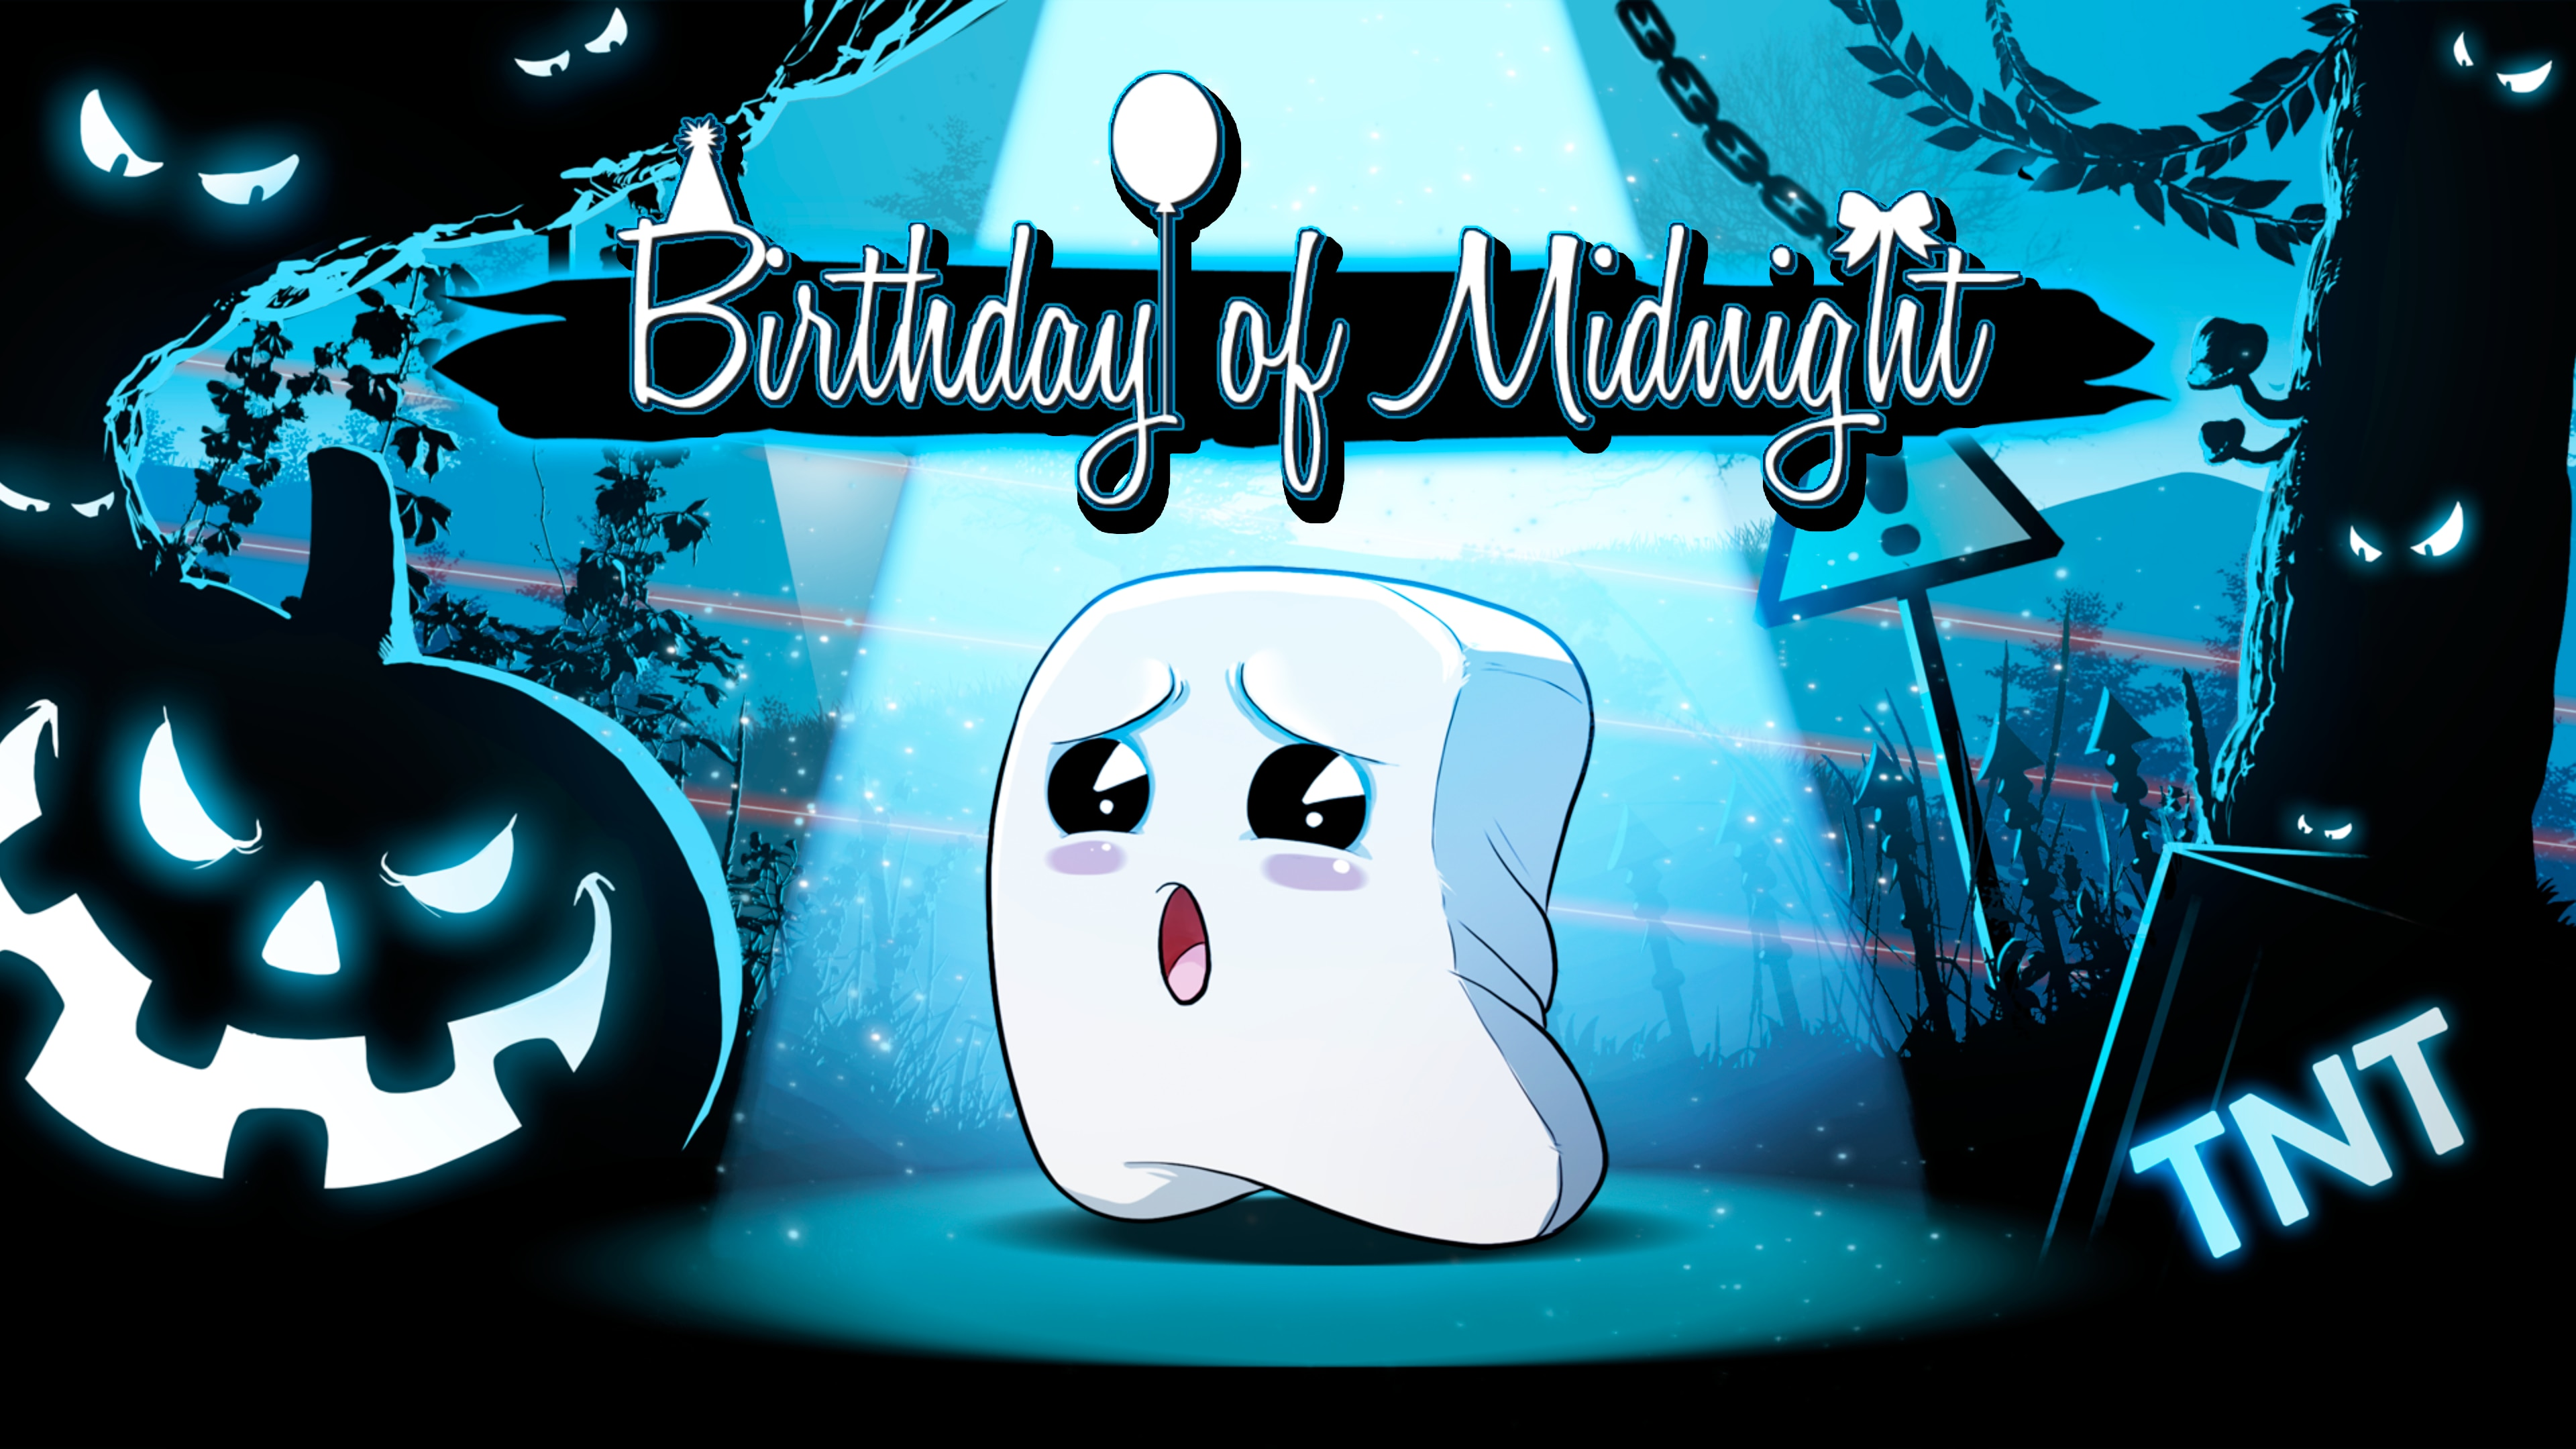 Birthday of Midnight